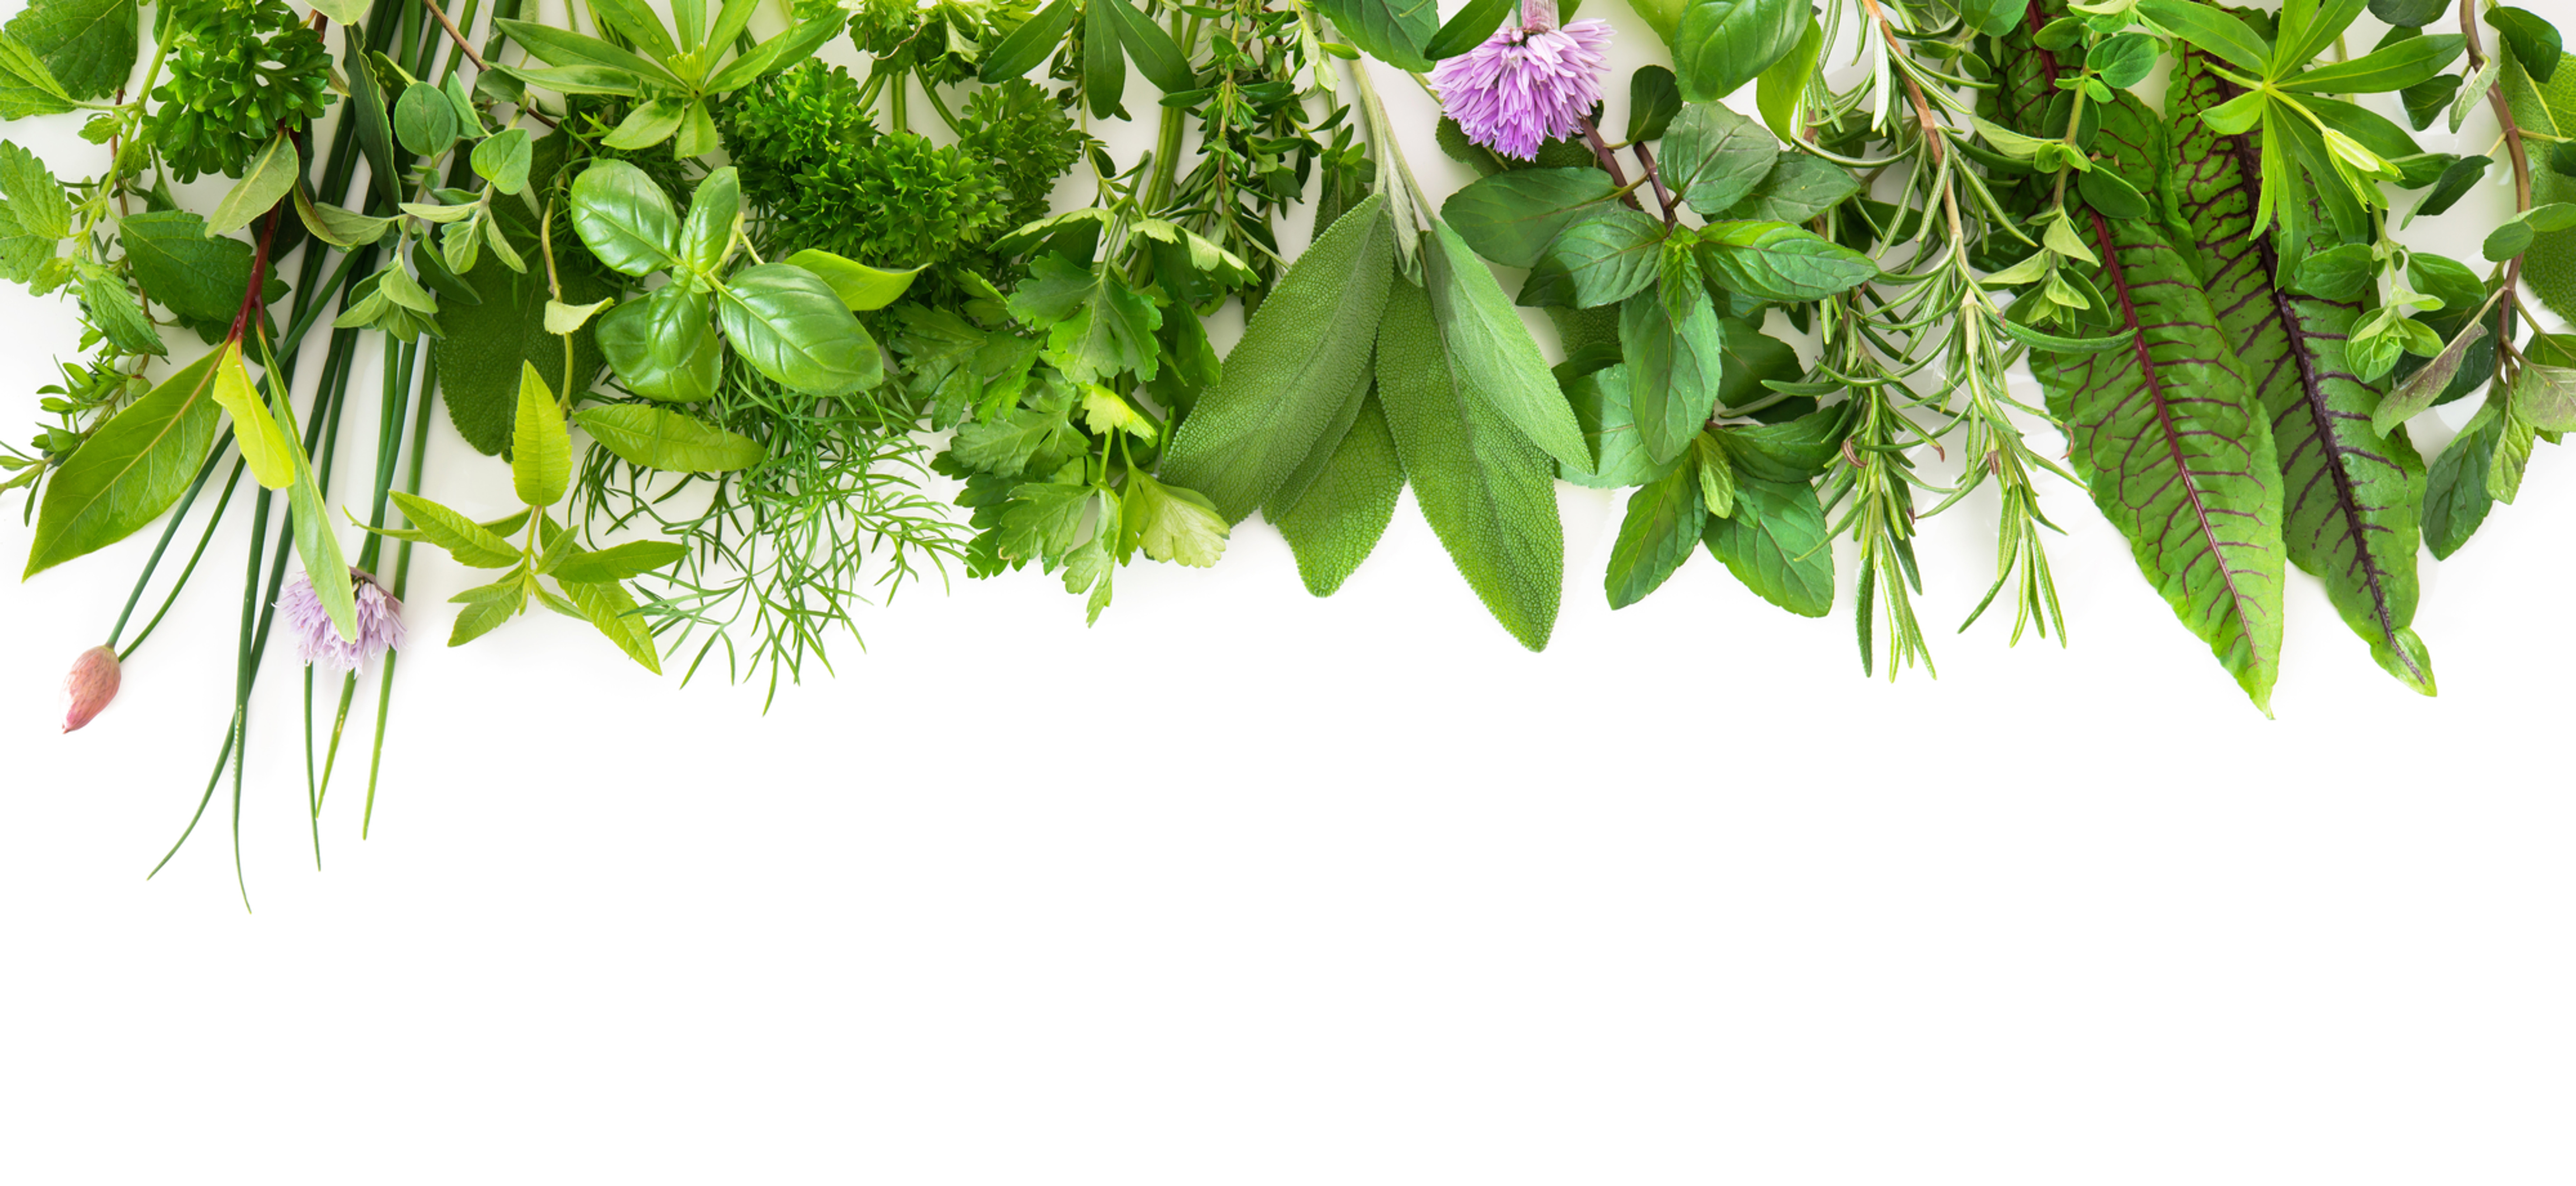 Freeman Herbs Market Pick Up